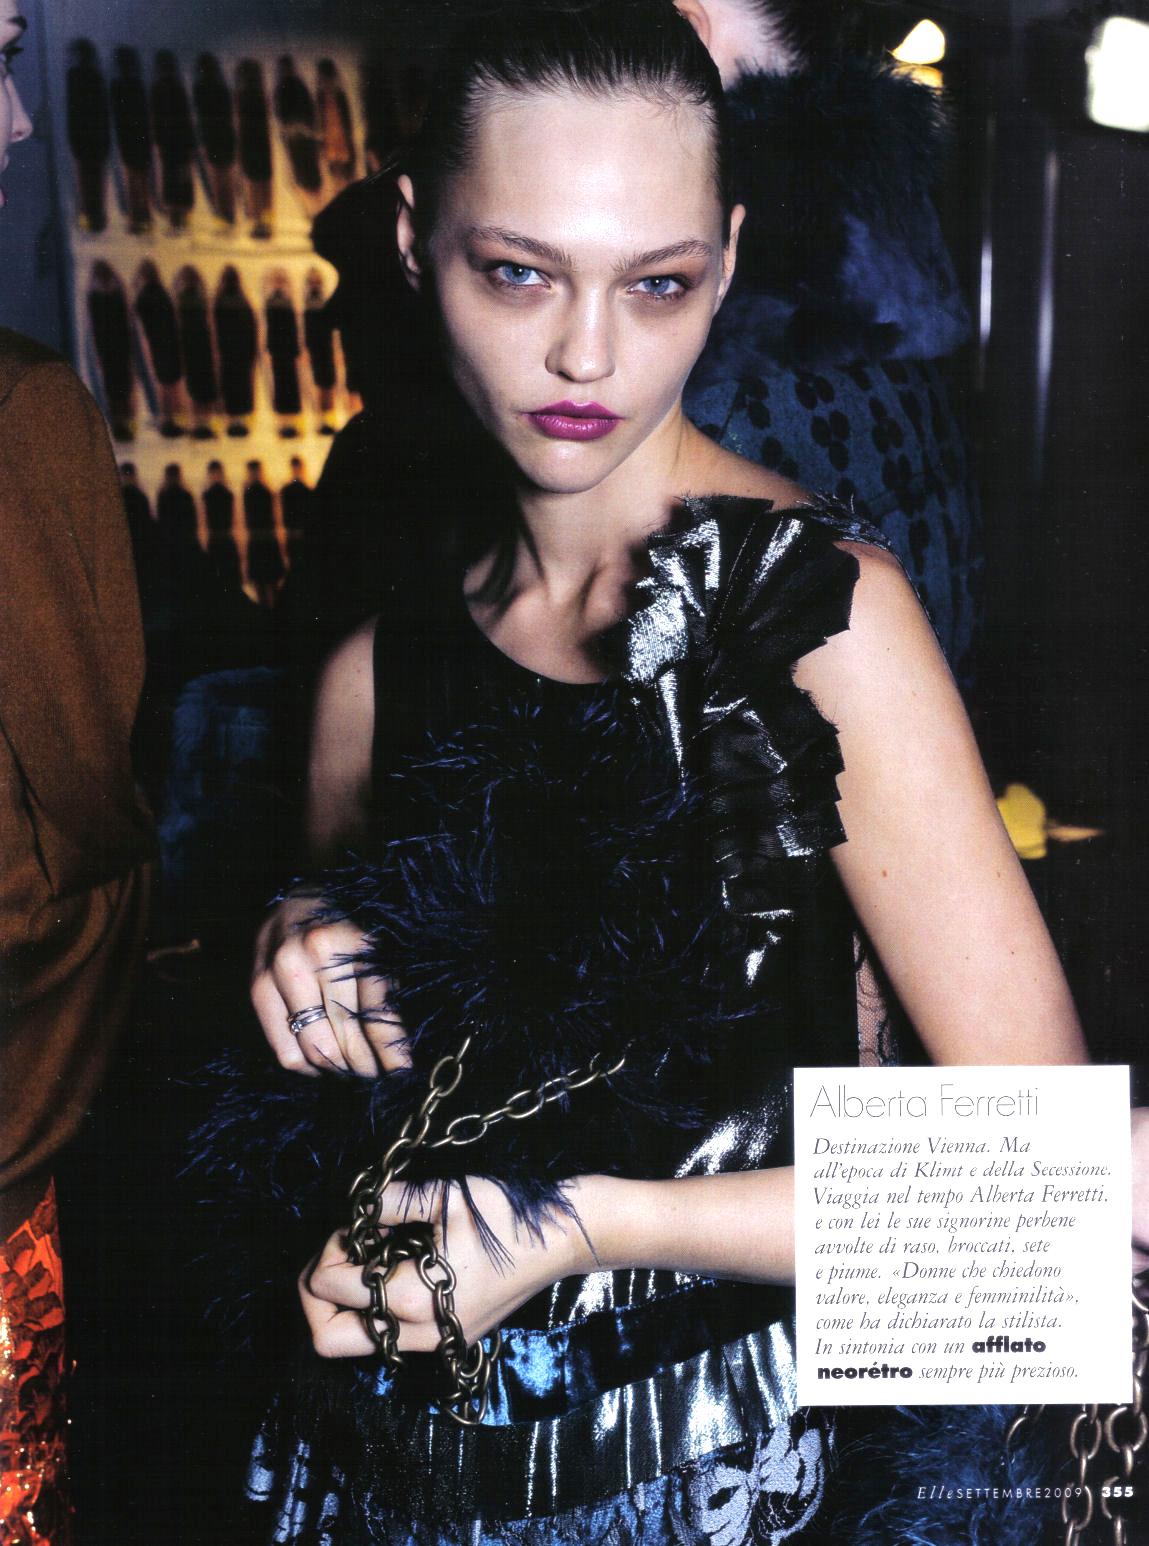 Sasha Pivovarova wearing Alberta Ferretti in Elle Italy September 2009